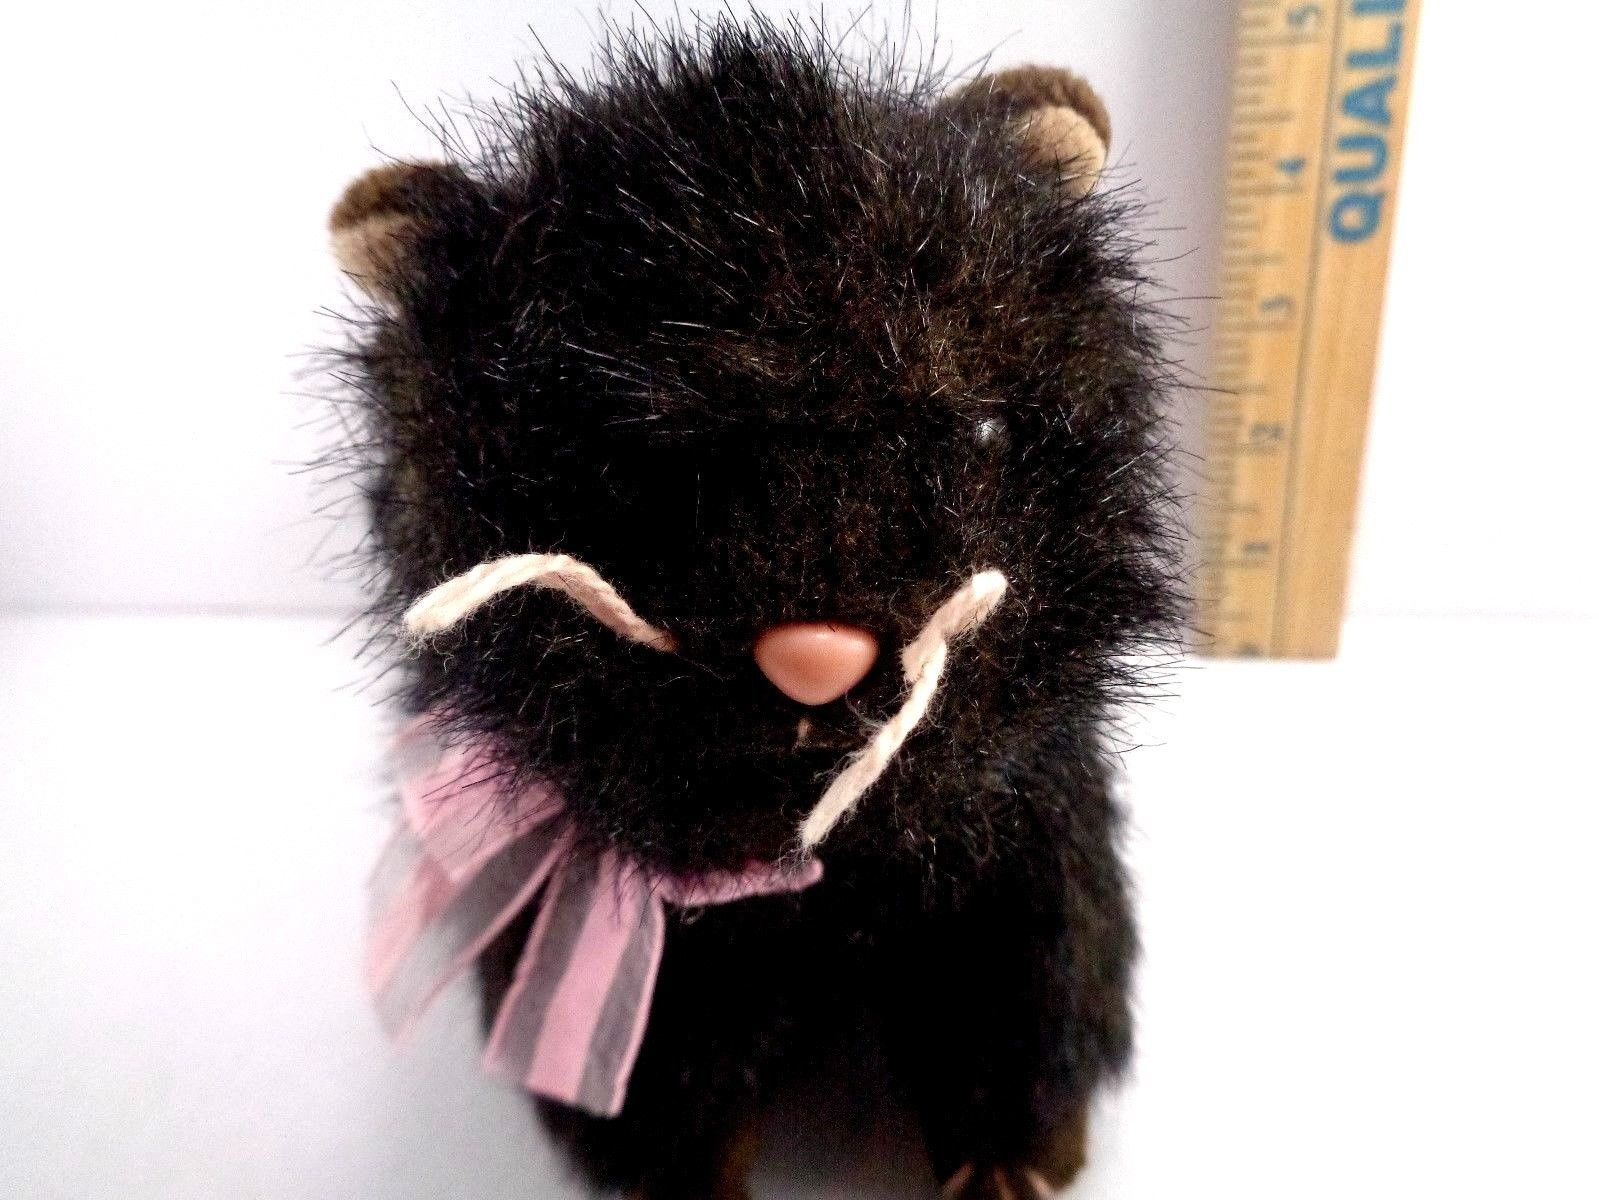 Halloween Ty Black Cat Heiress Pink Bow Plush Stuffed Animal Toy Doll image 3